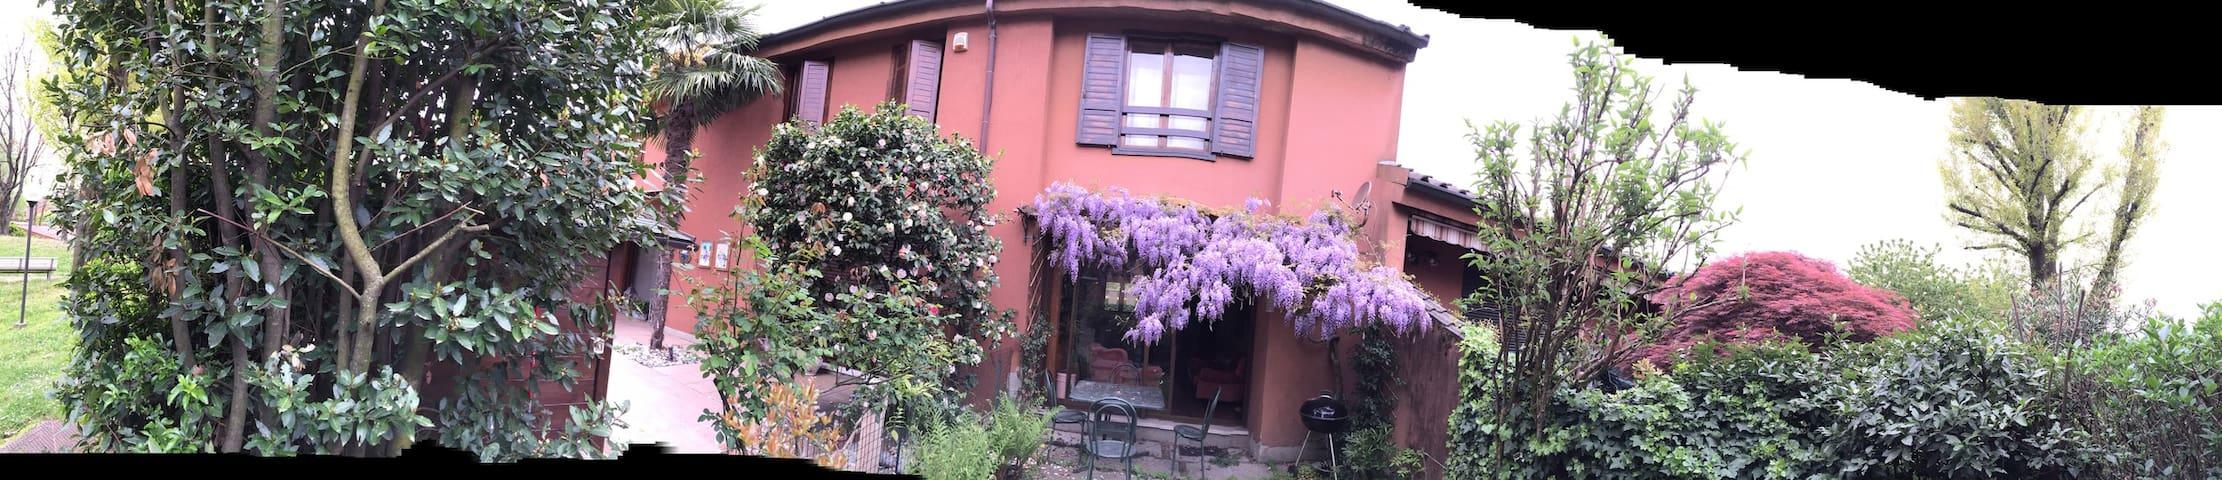 Glycine Villa 30 min from Milan - Arlate - Huis